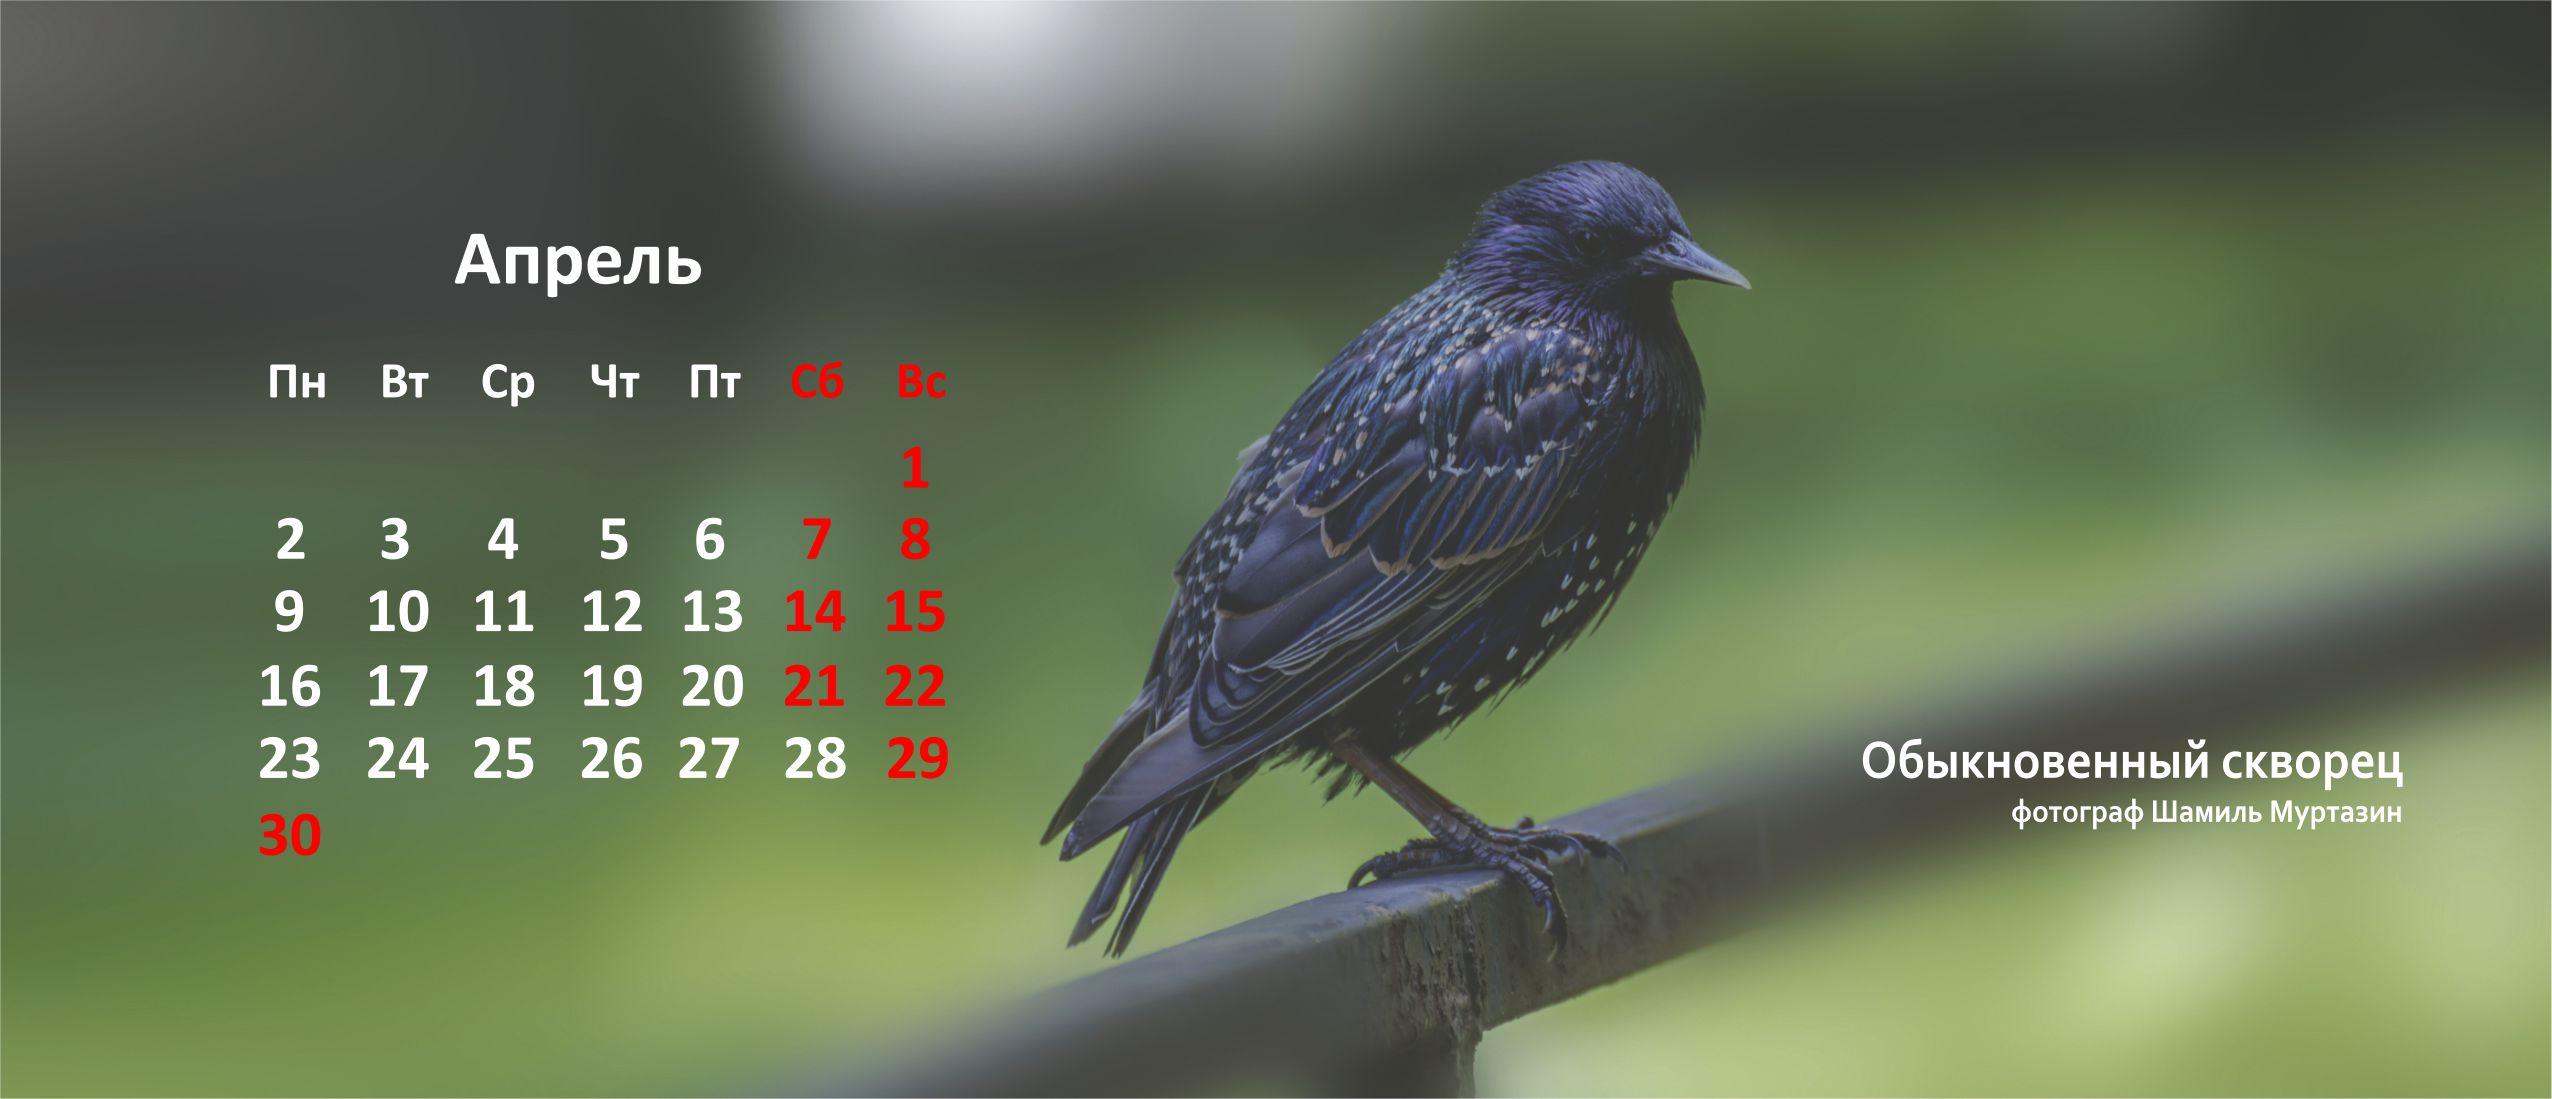 Скворец Птицы Уфы 2018